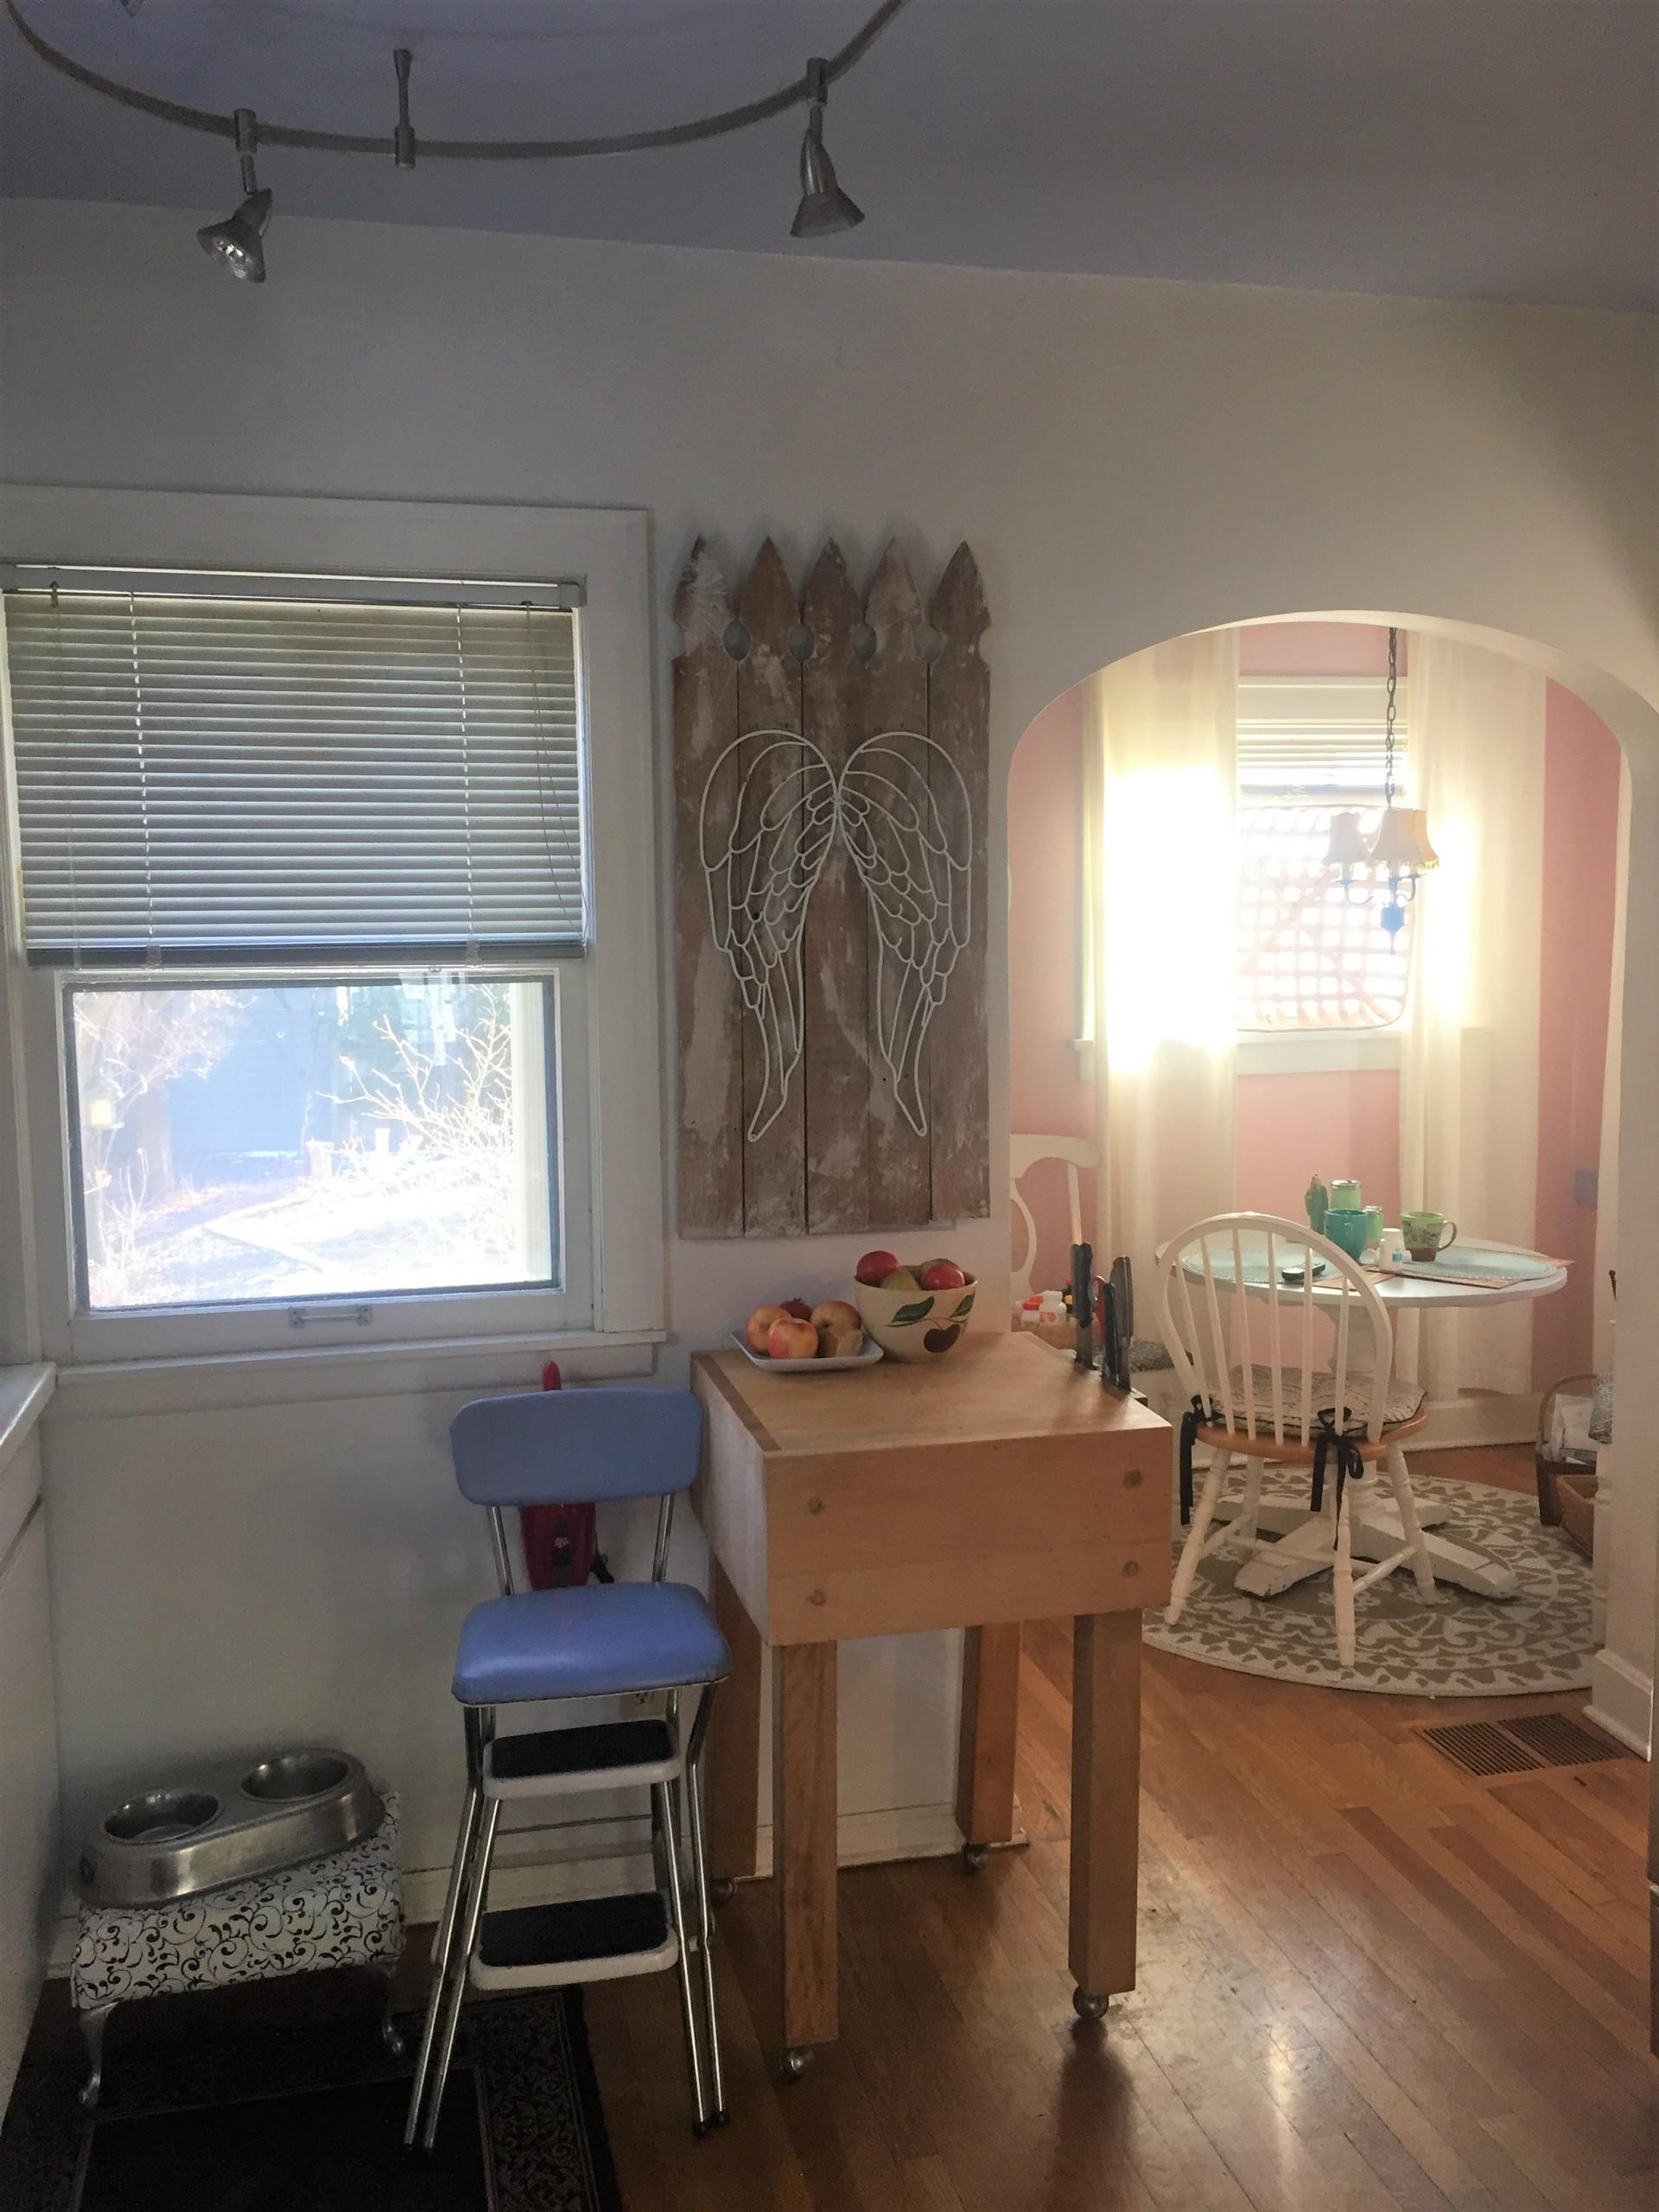 Barnet Kitchen Remodel (design collaboration with Owner)Kit